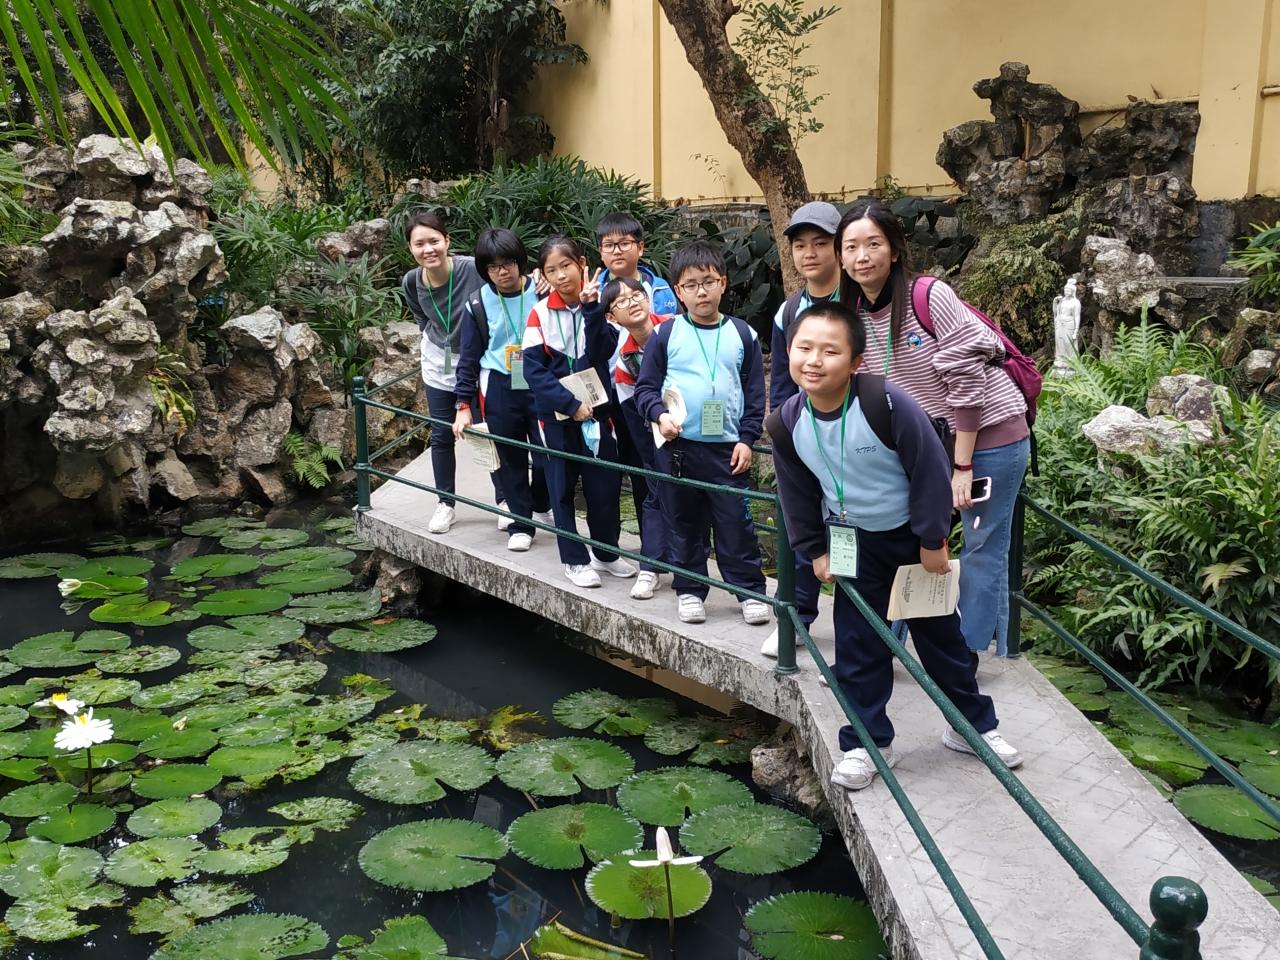 http://keito.school.hk/sites/default/files/batch_img_20191217_105512.jpg